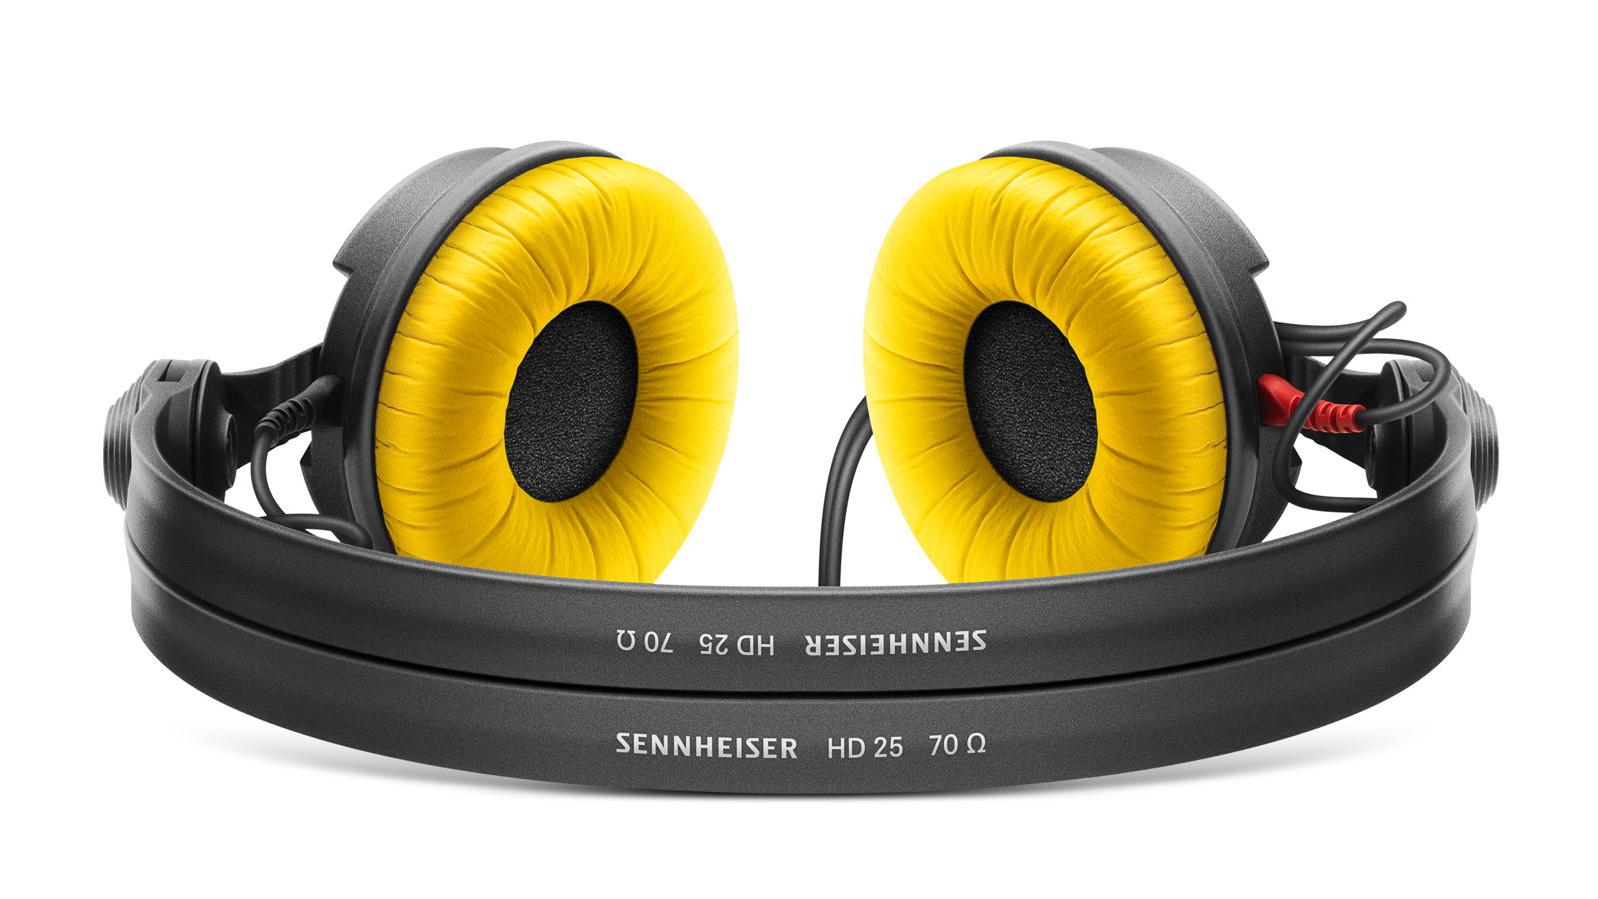 Sennheiser HD 25